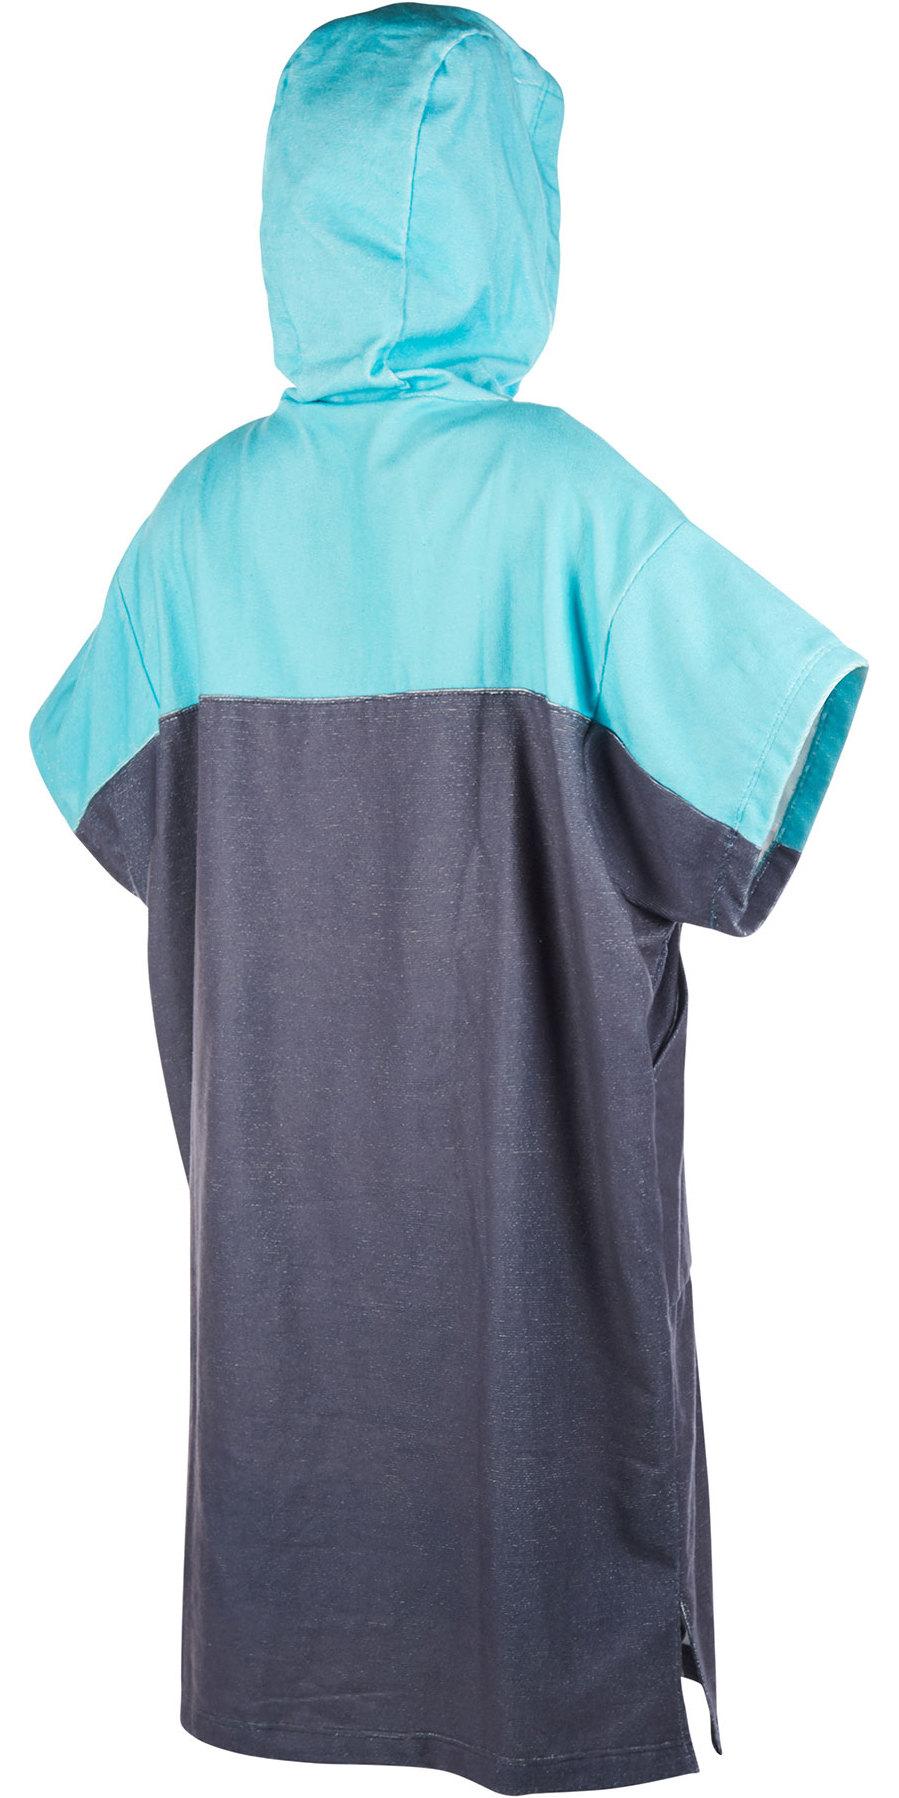 2019 Mystic Regular Poncho / Change Robe Mint 190169